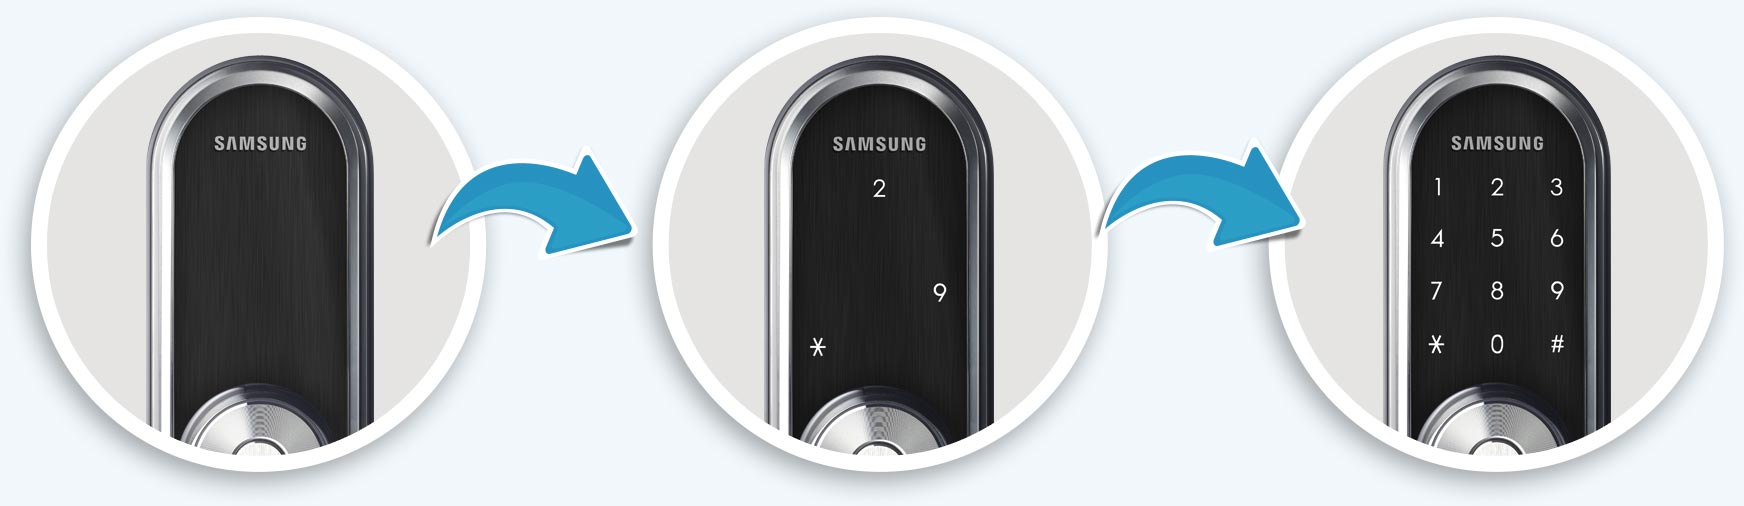 Samsung SHP-DS510